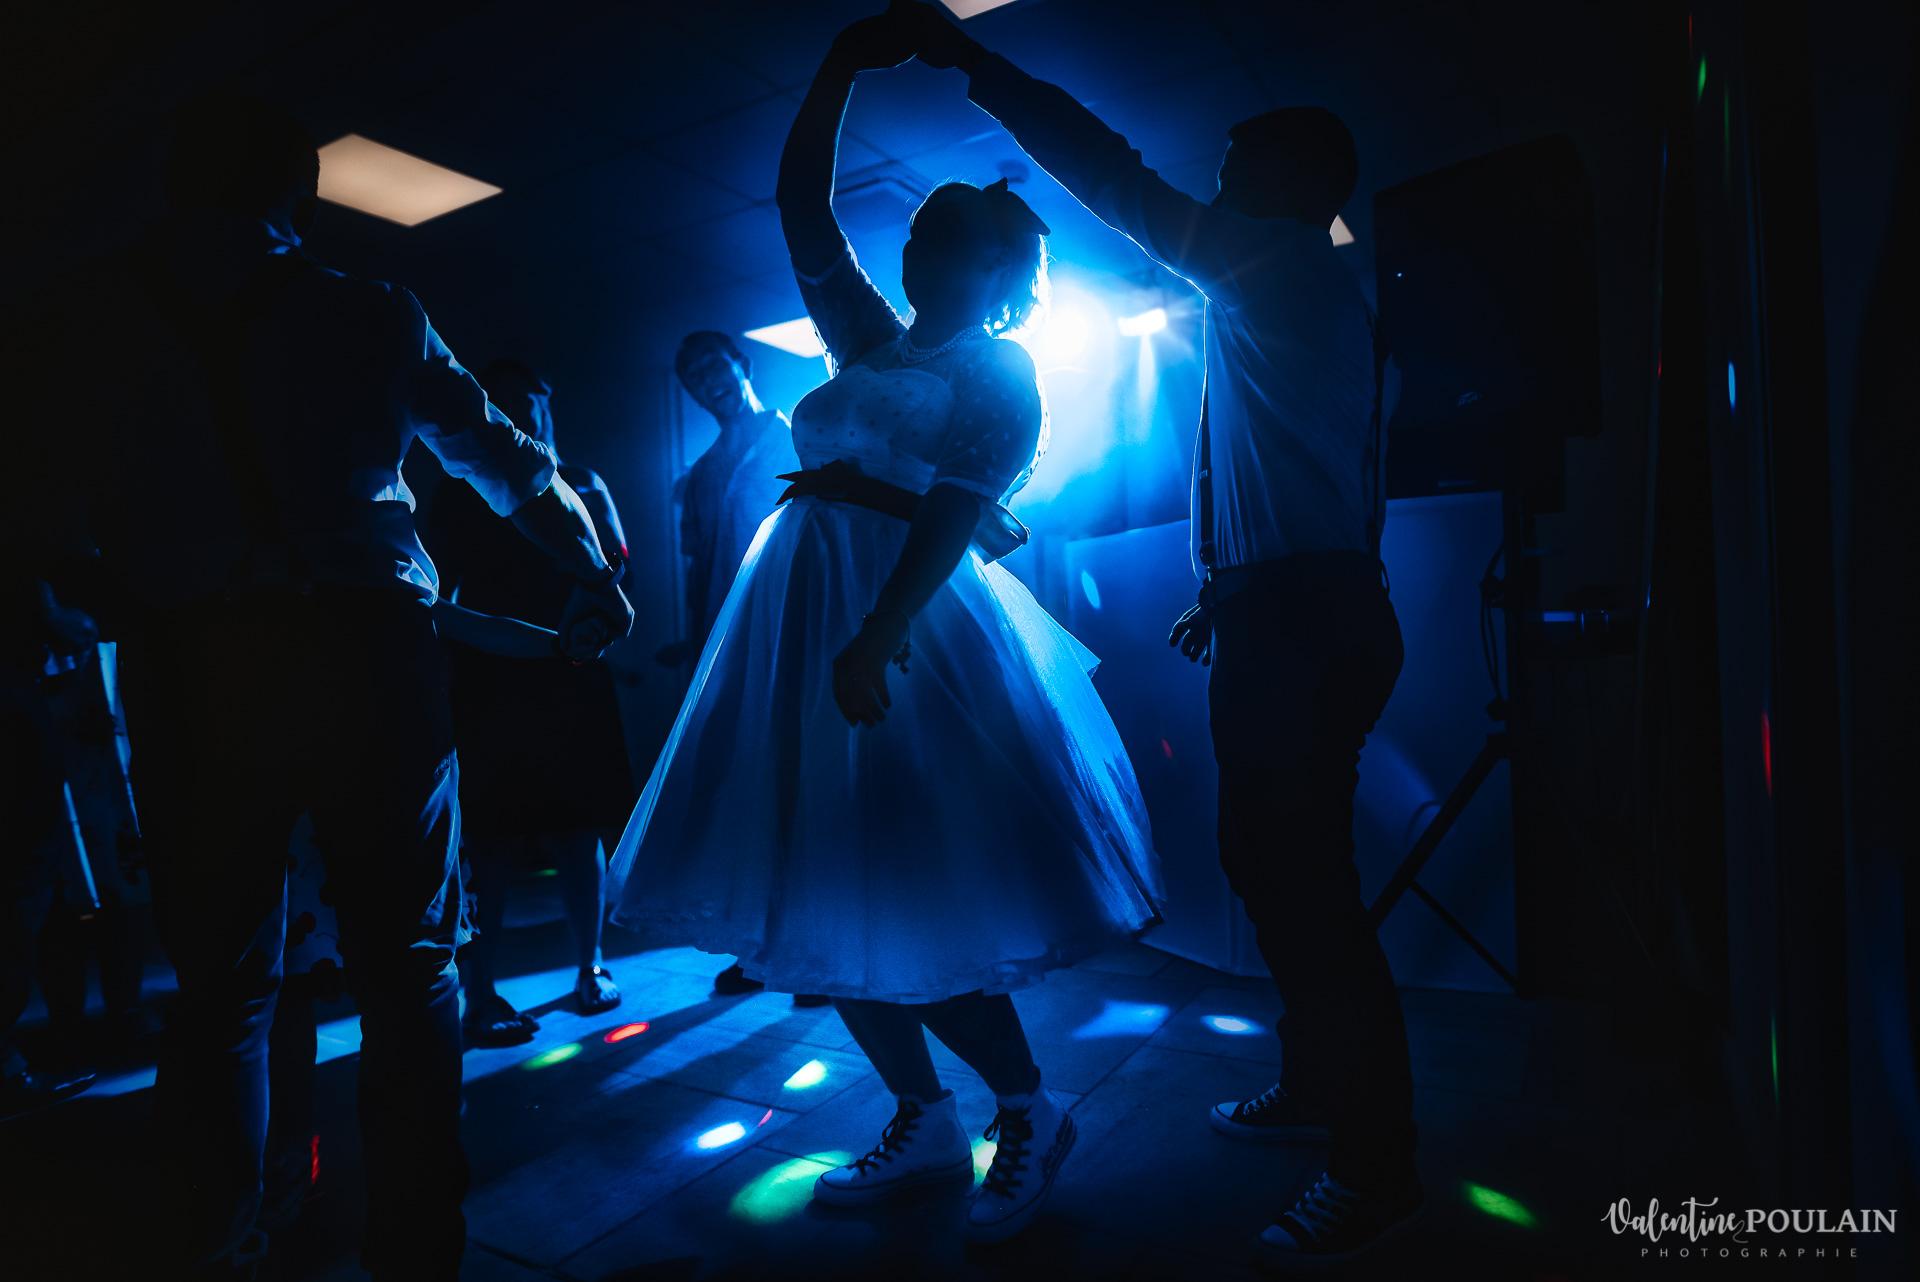 Mariage vintage rockabilly - Valentine Poulain danser